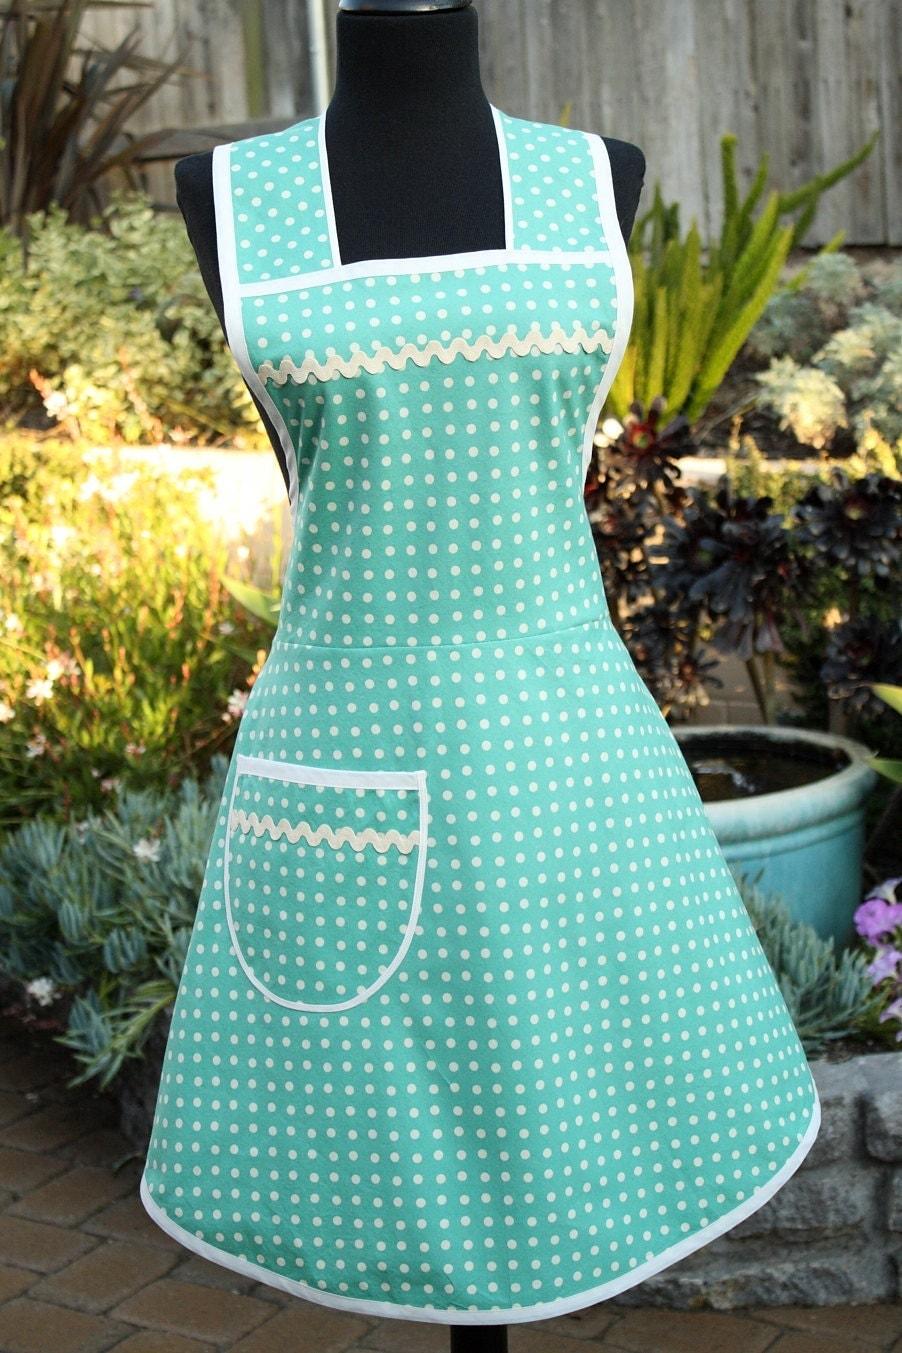 Teal Pinafore Retro Full Apron Vintage Style Polka Dots